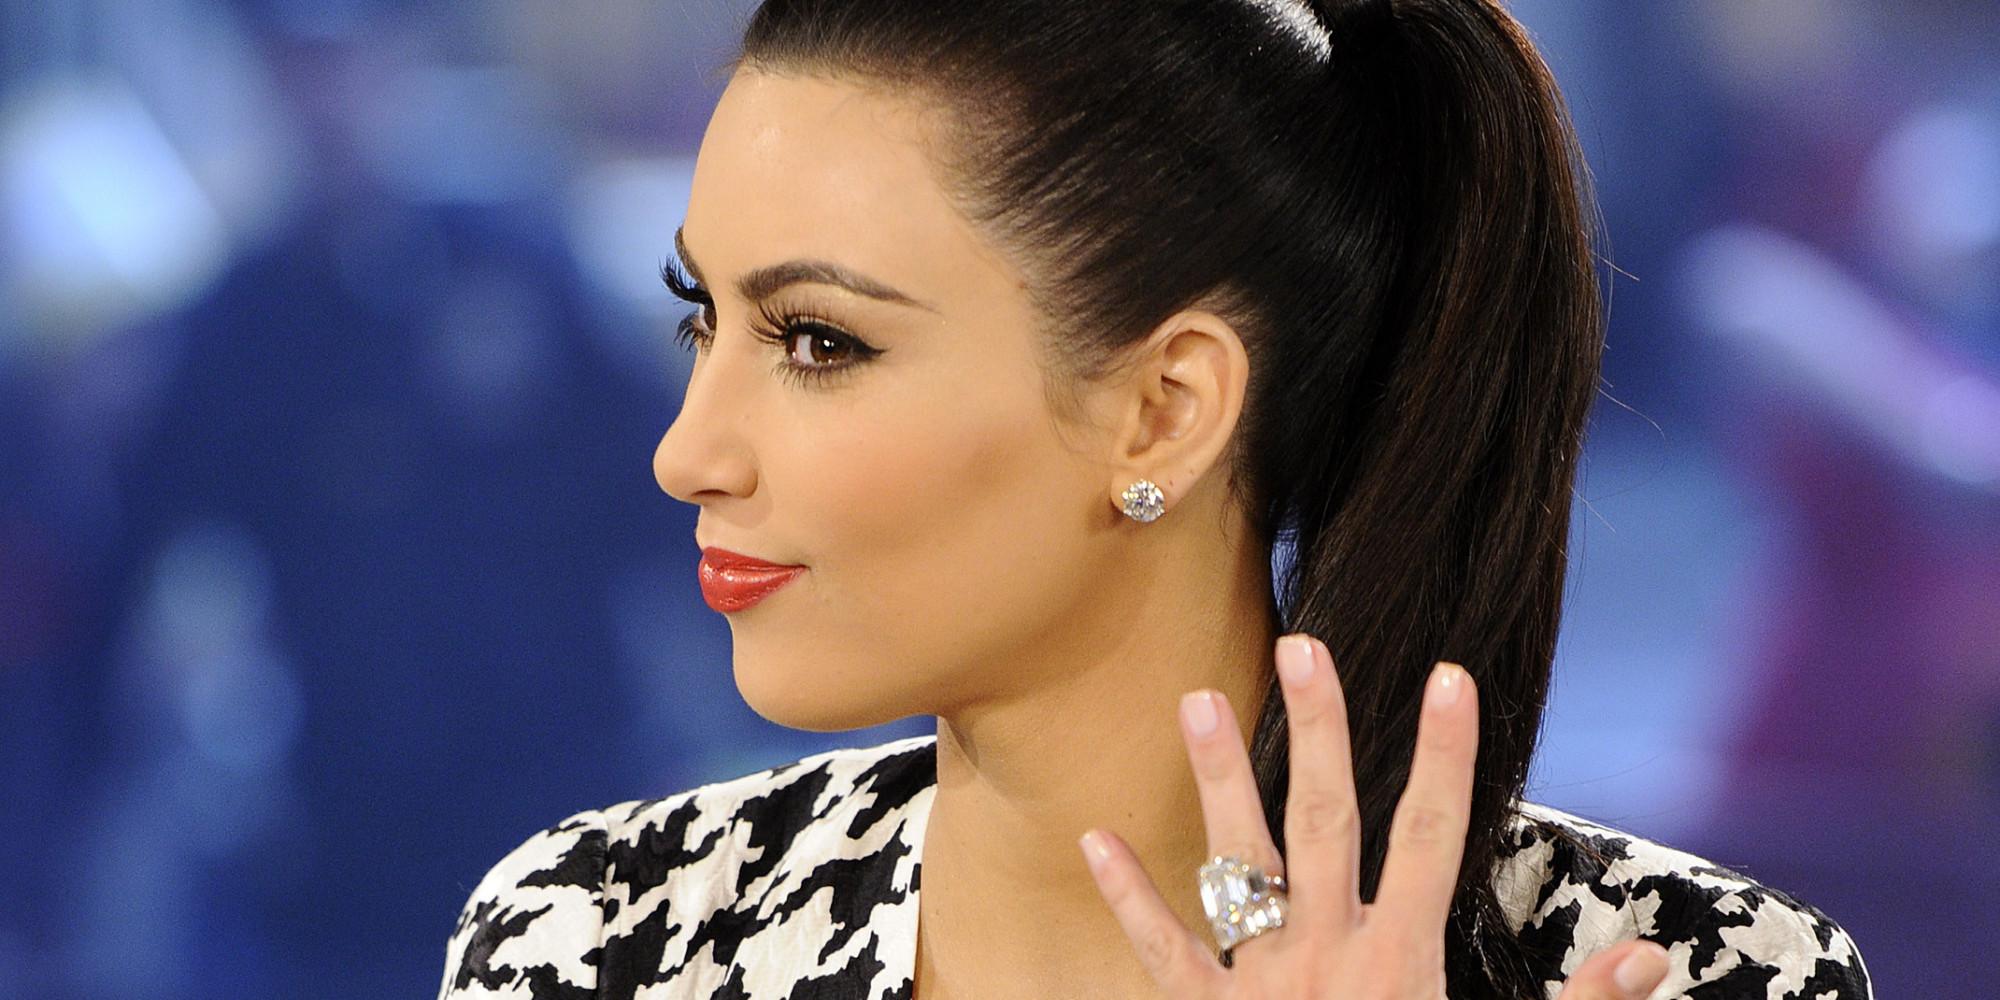 Look - Kim gets kardashian engaged video